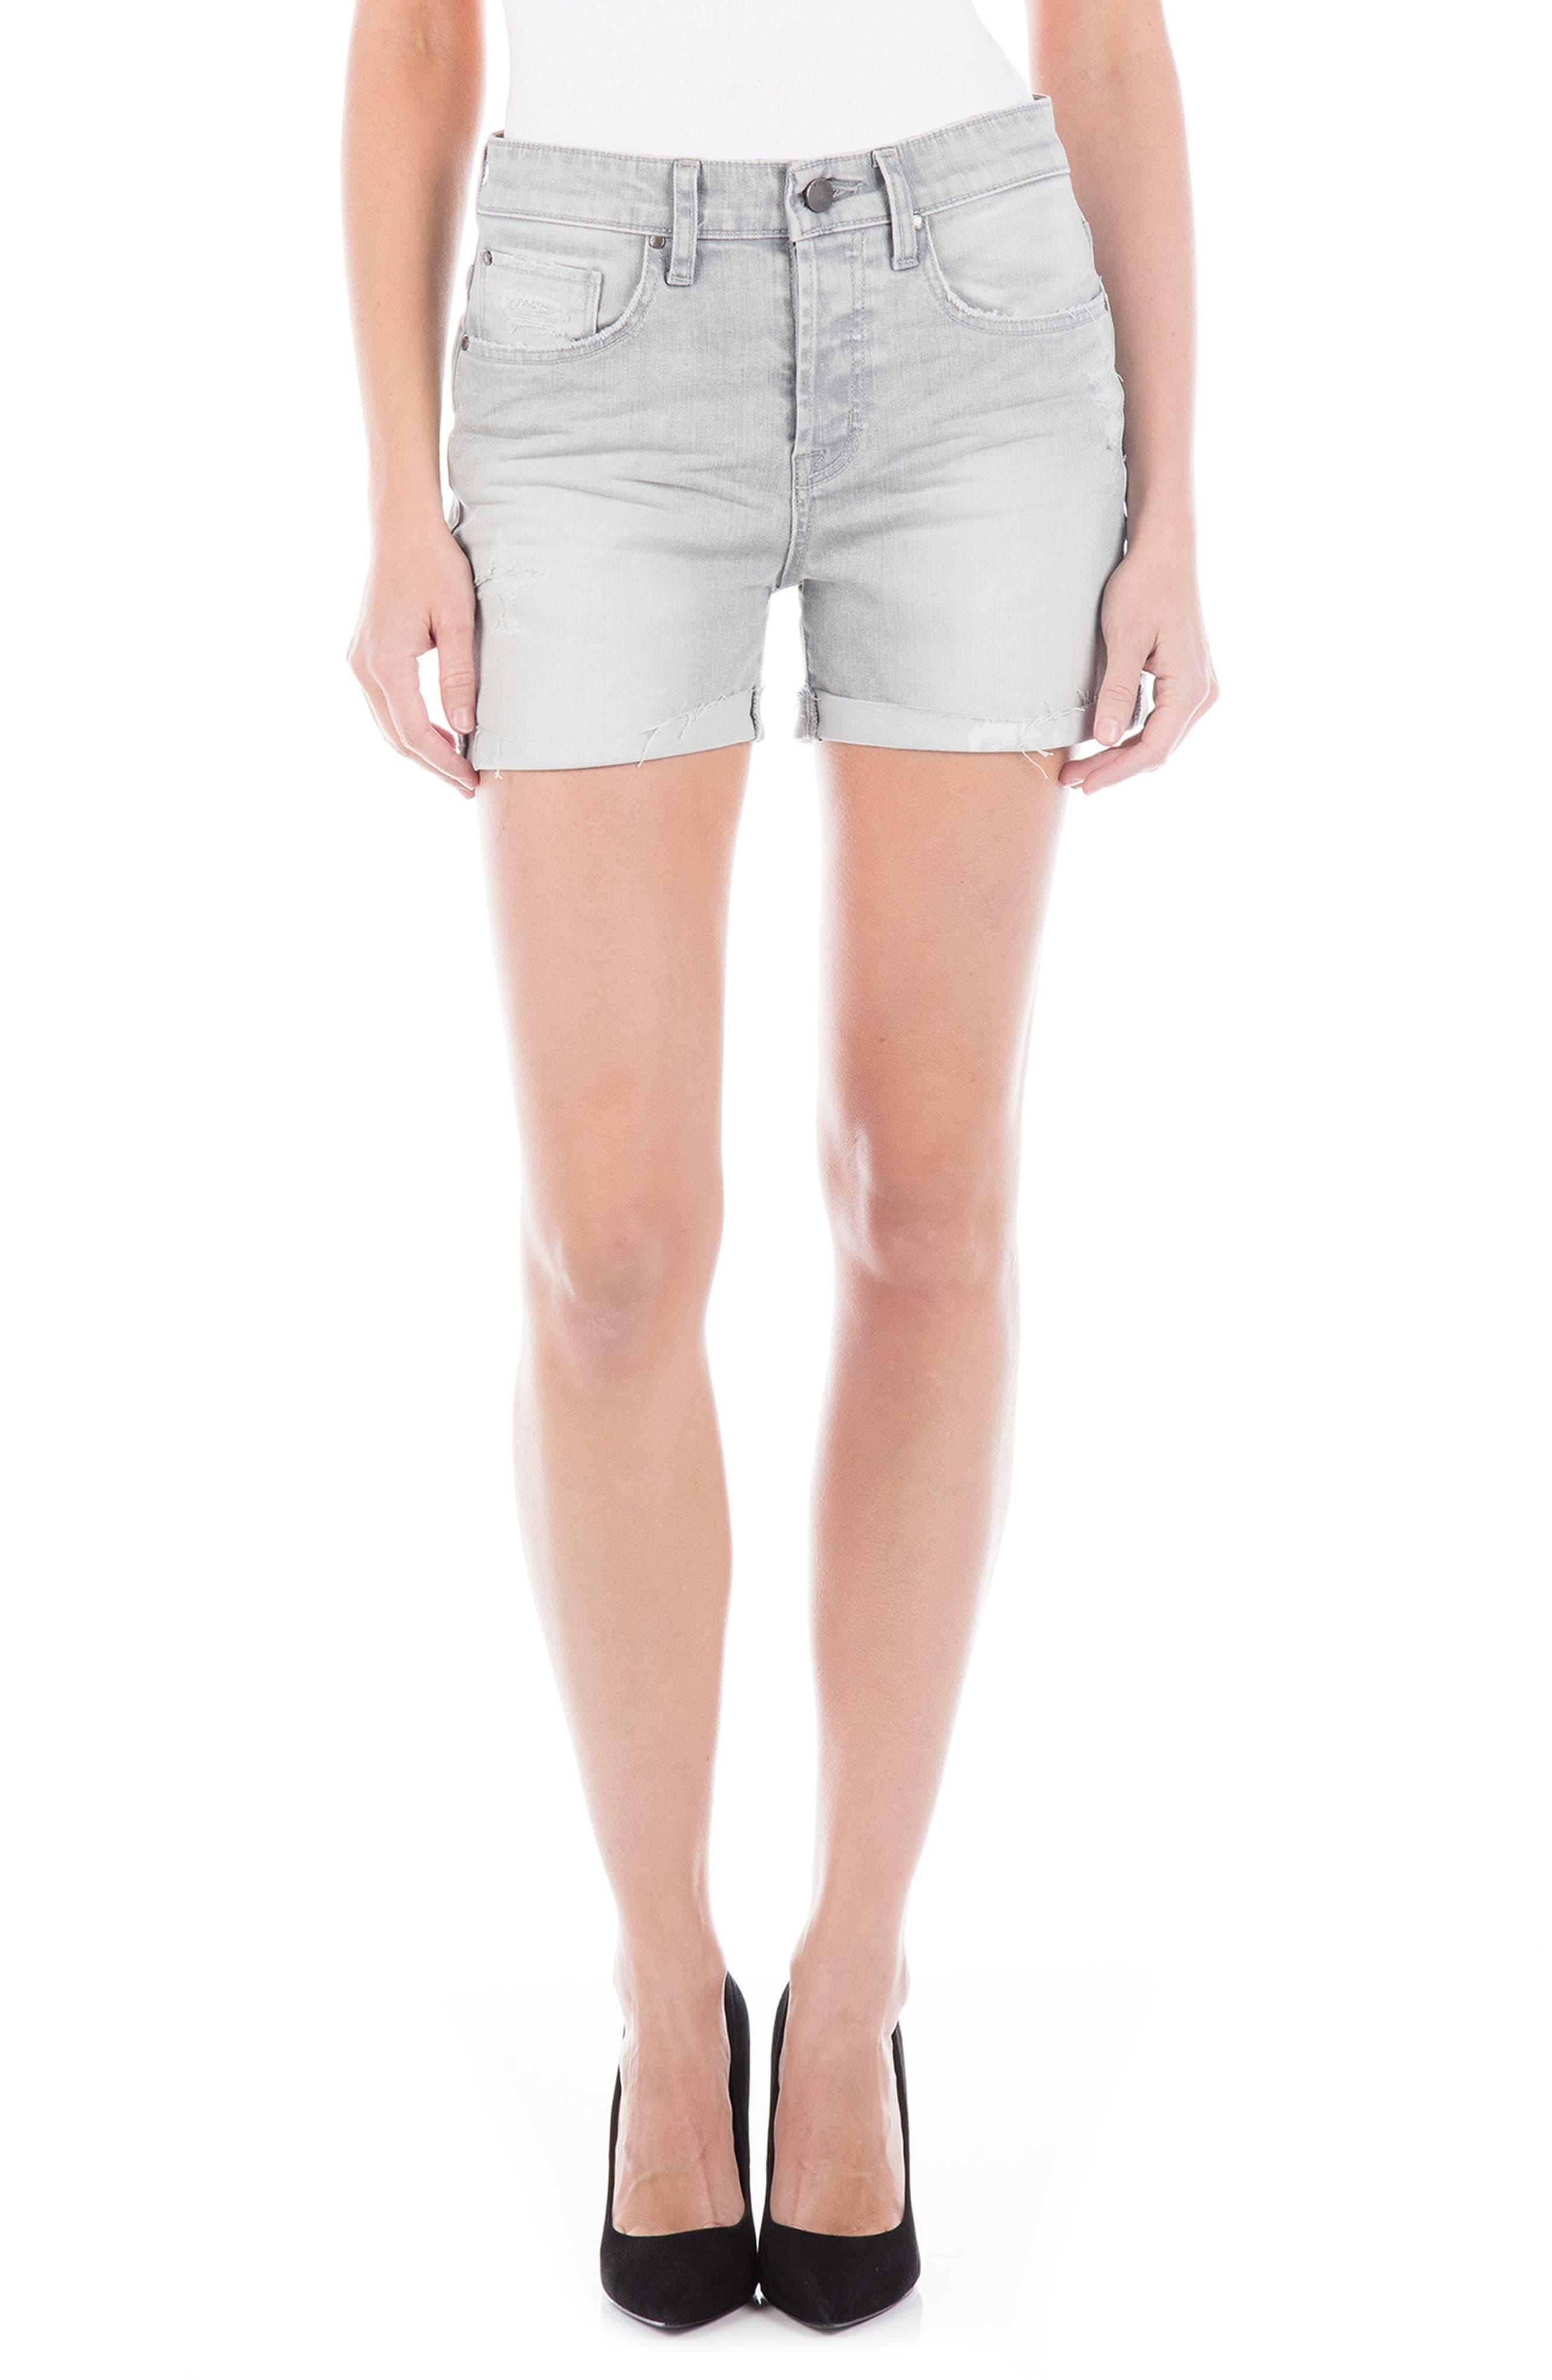 Jonesy High Waist Denim Shorts,                         Main,                         color, MERCURY VINTAGE